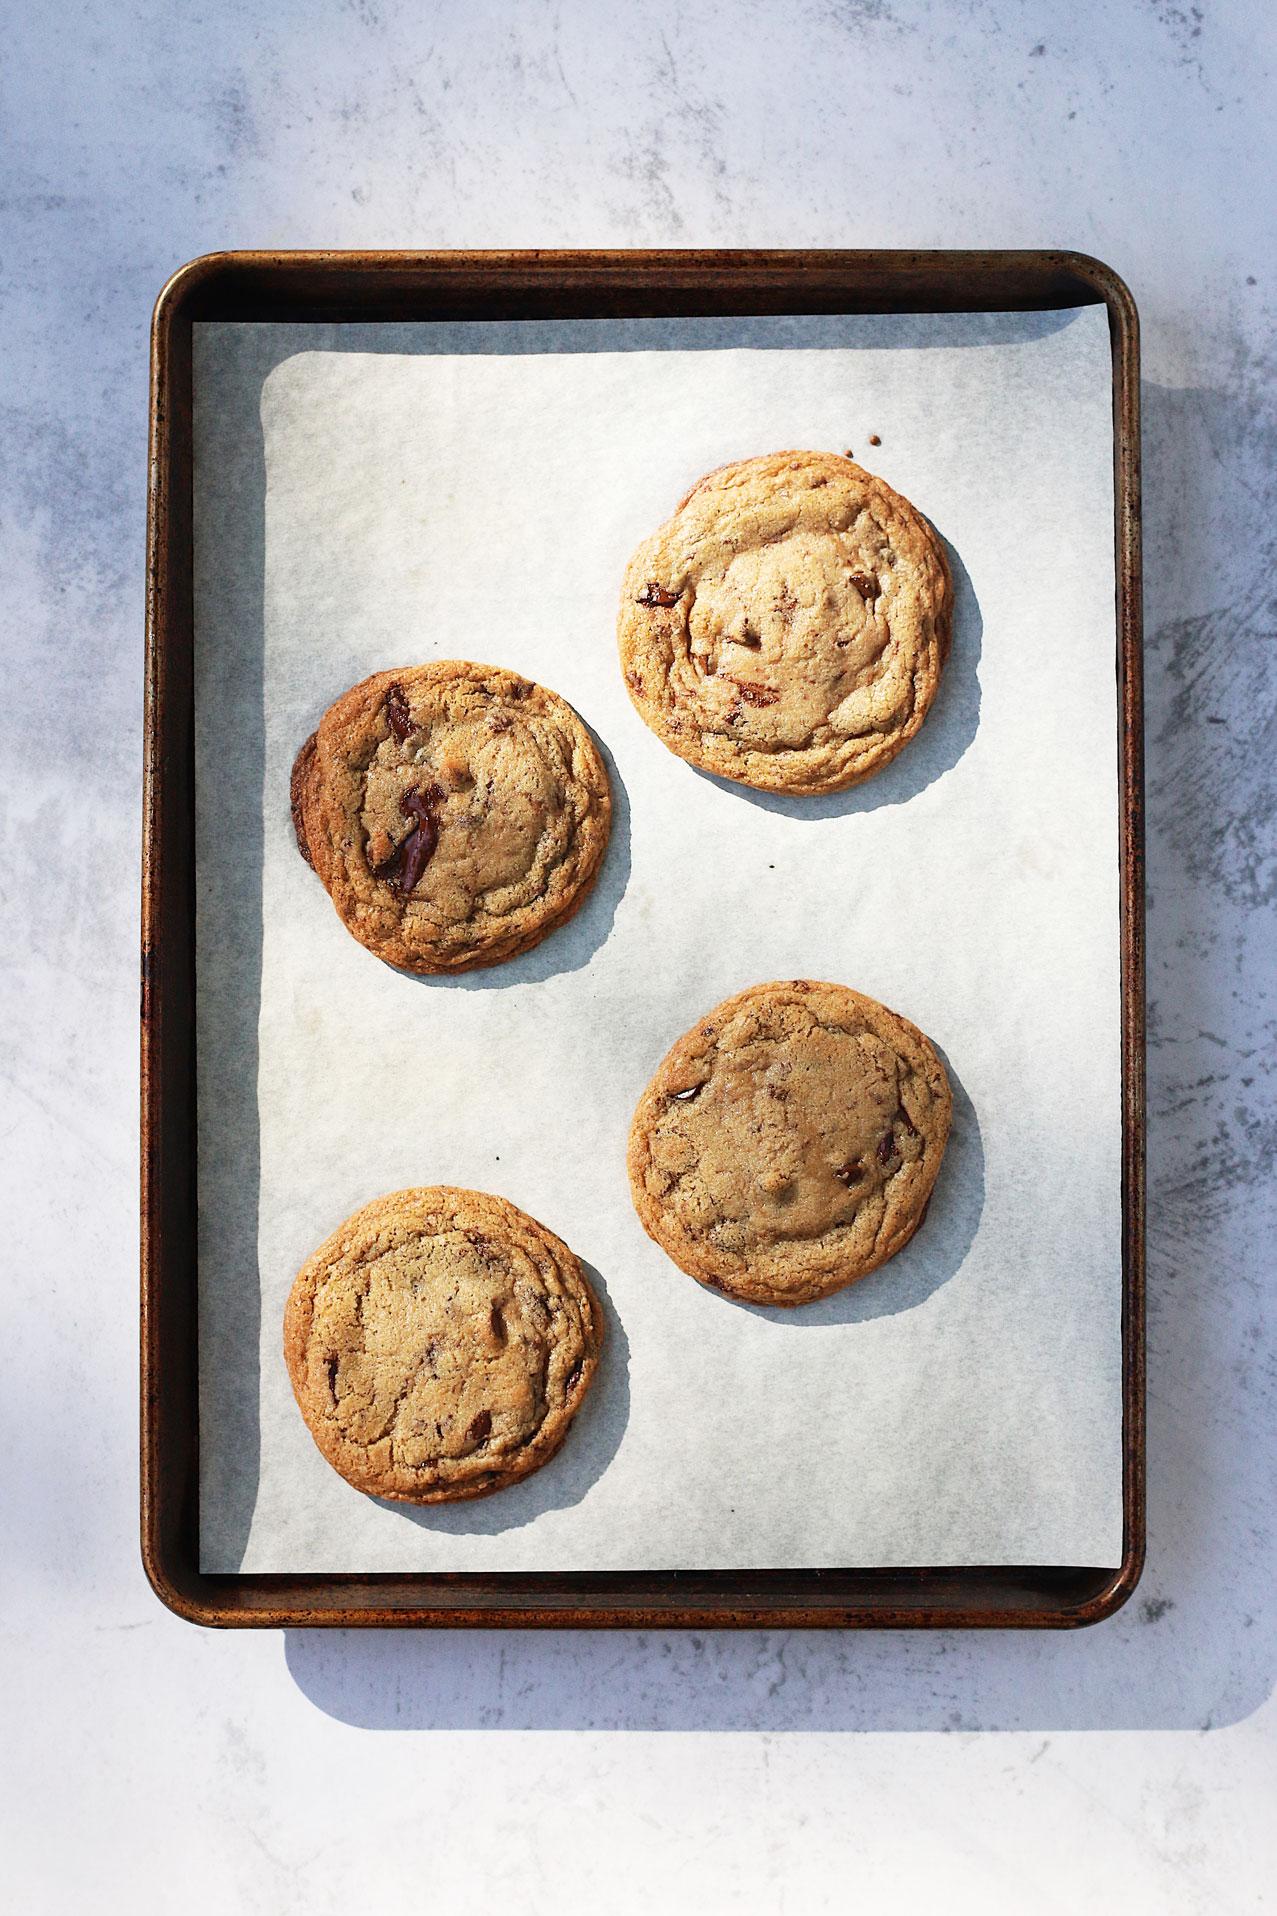 herbakinglab-best-chocolate-chip-cookie-bake-off-ba's-best-tray